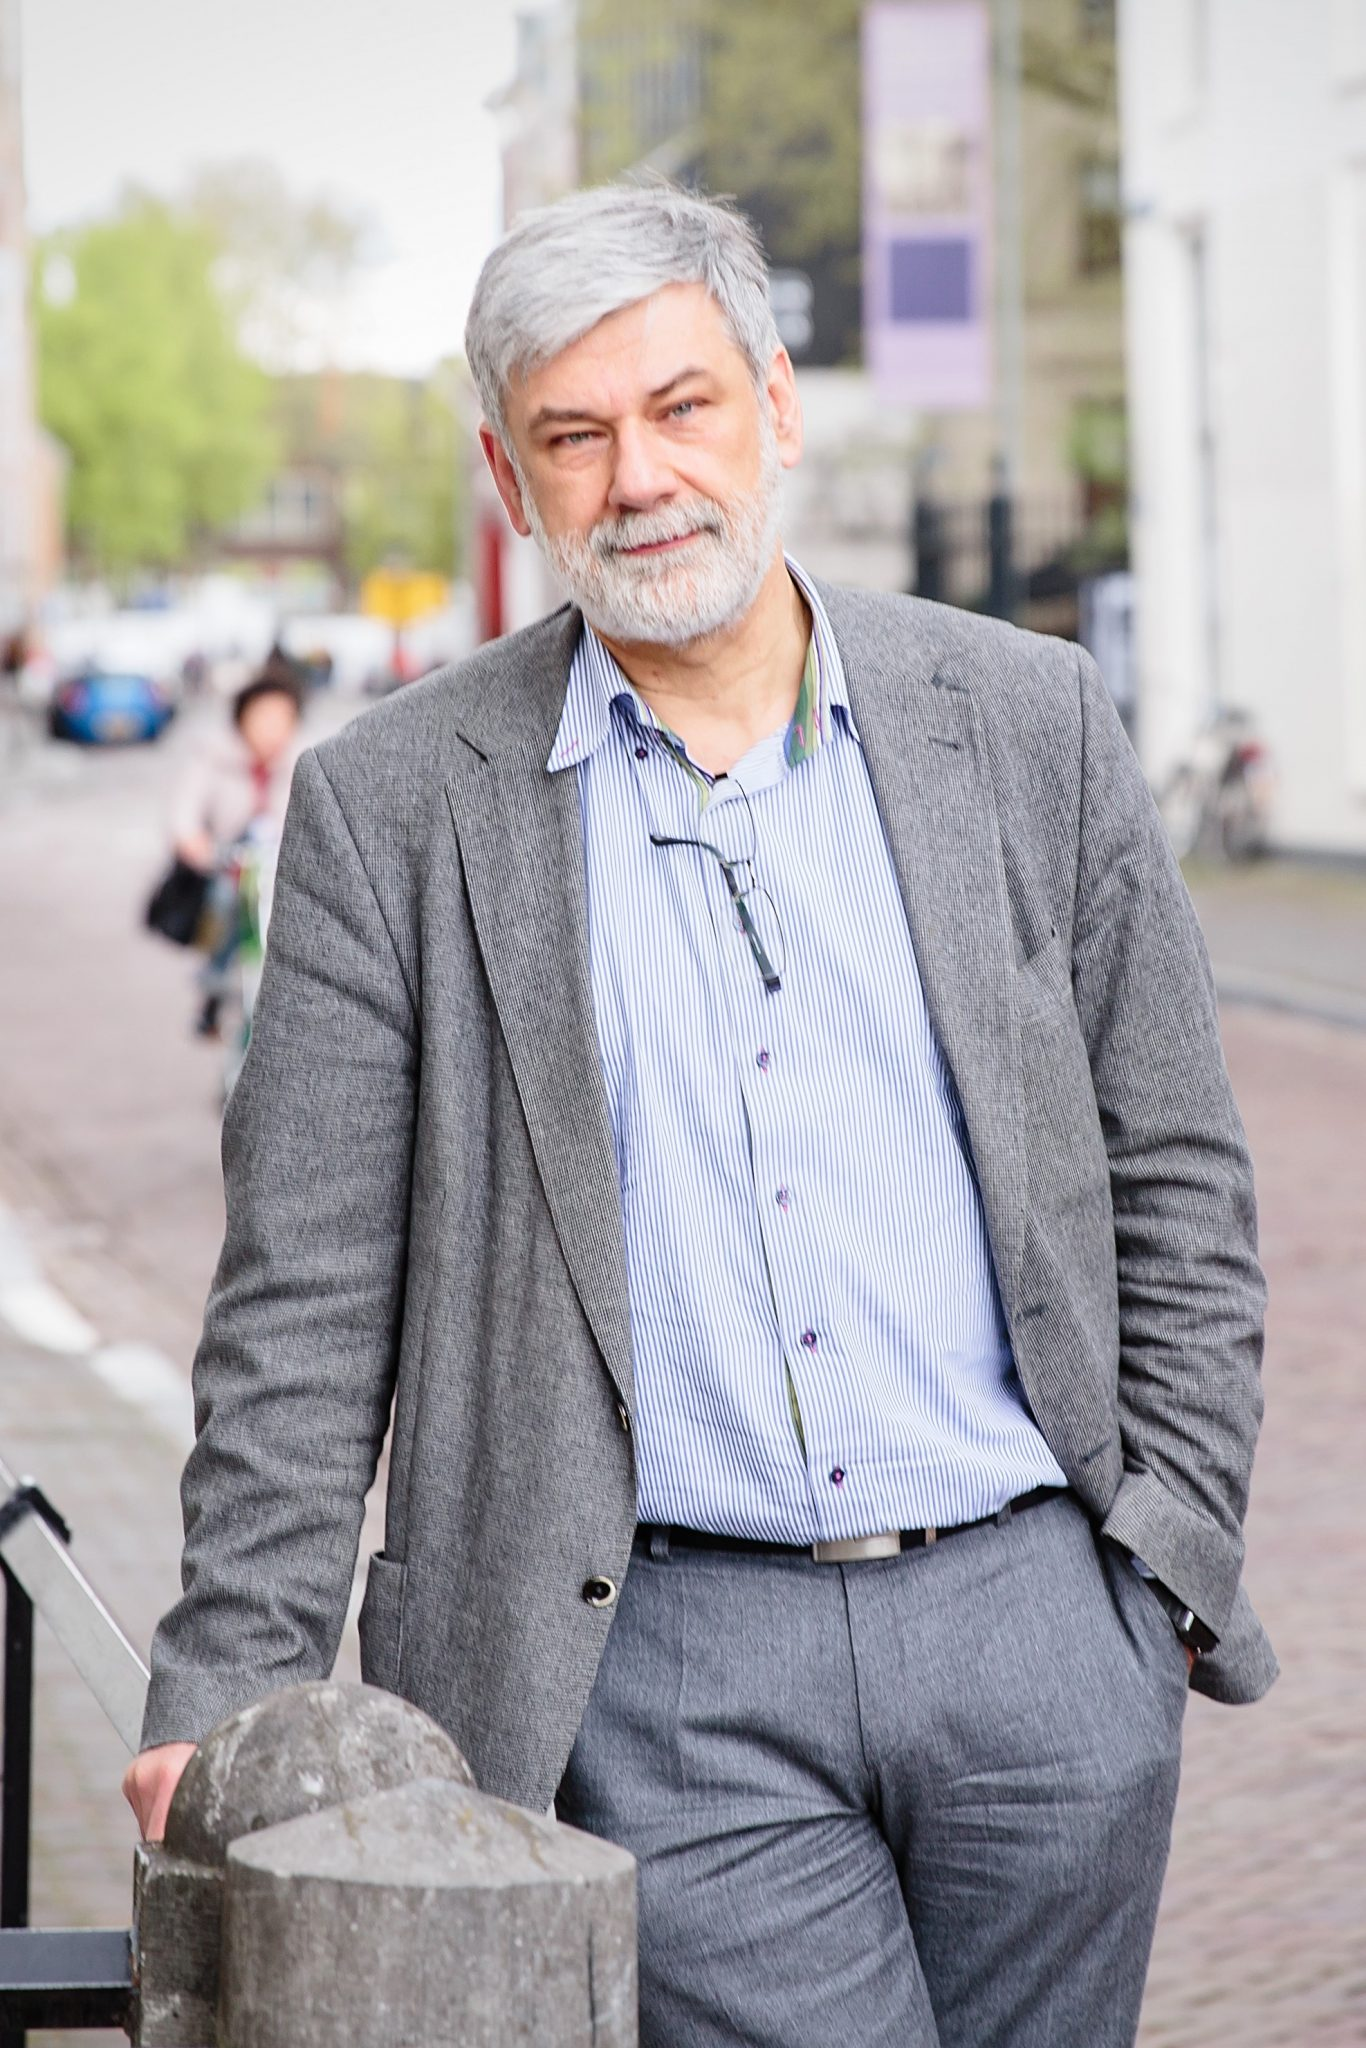 Philippe Delespaul